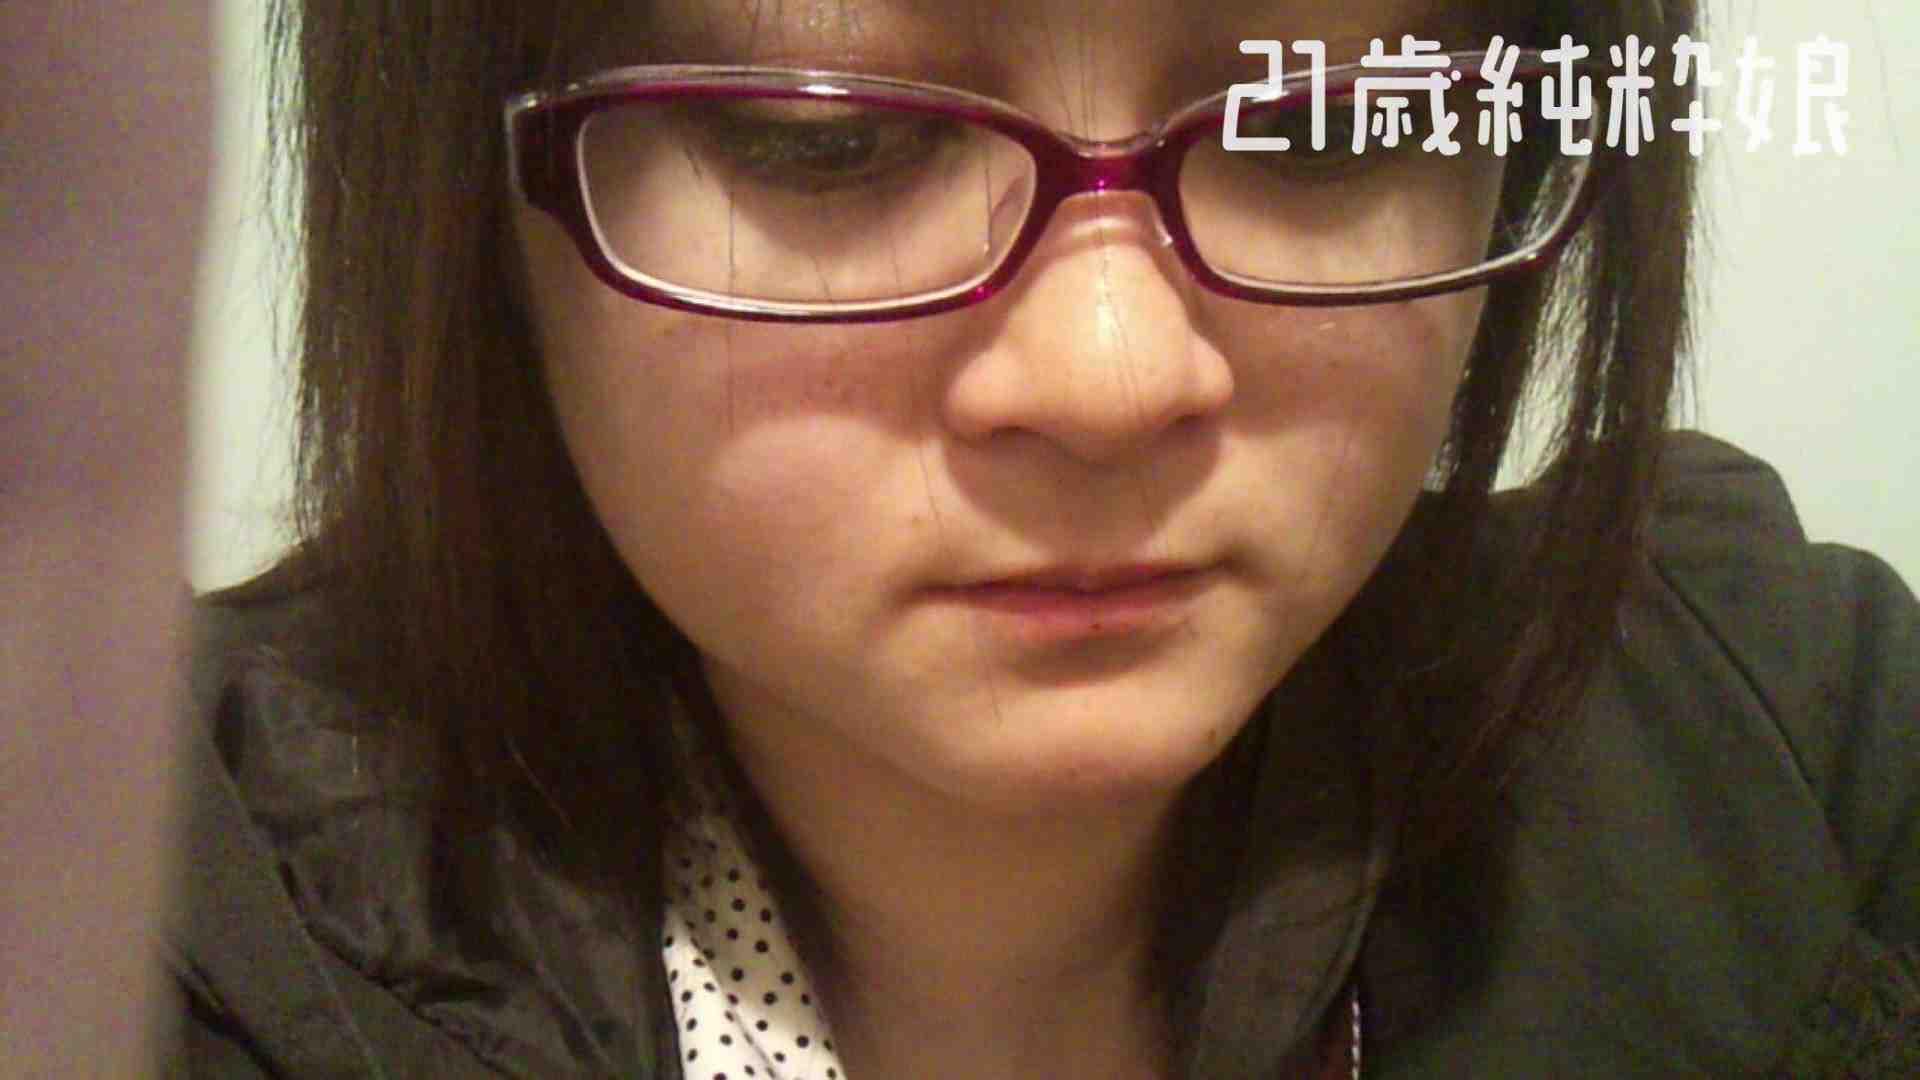 Gカップ21歳純粋嬢第2弾Vol.5 OLのエロ生活 ヌード画像 108連発 92